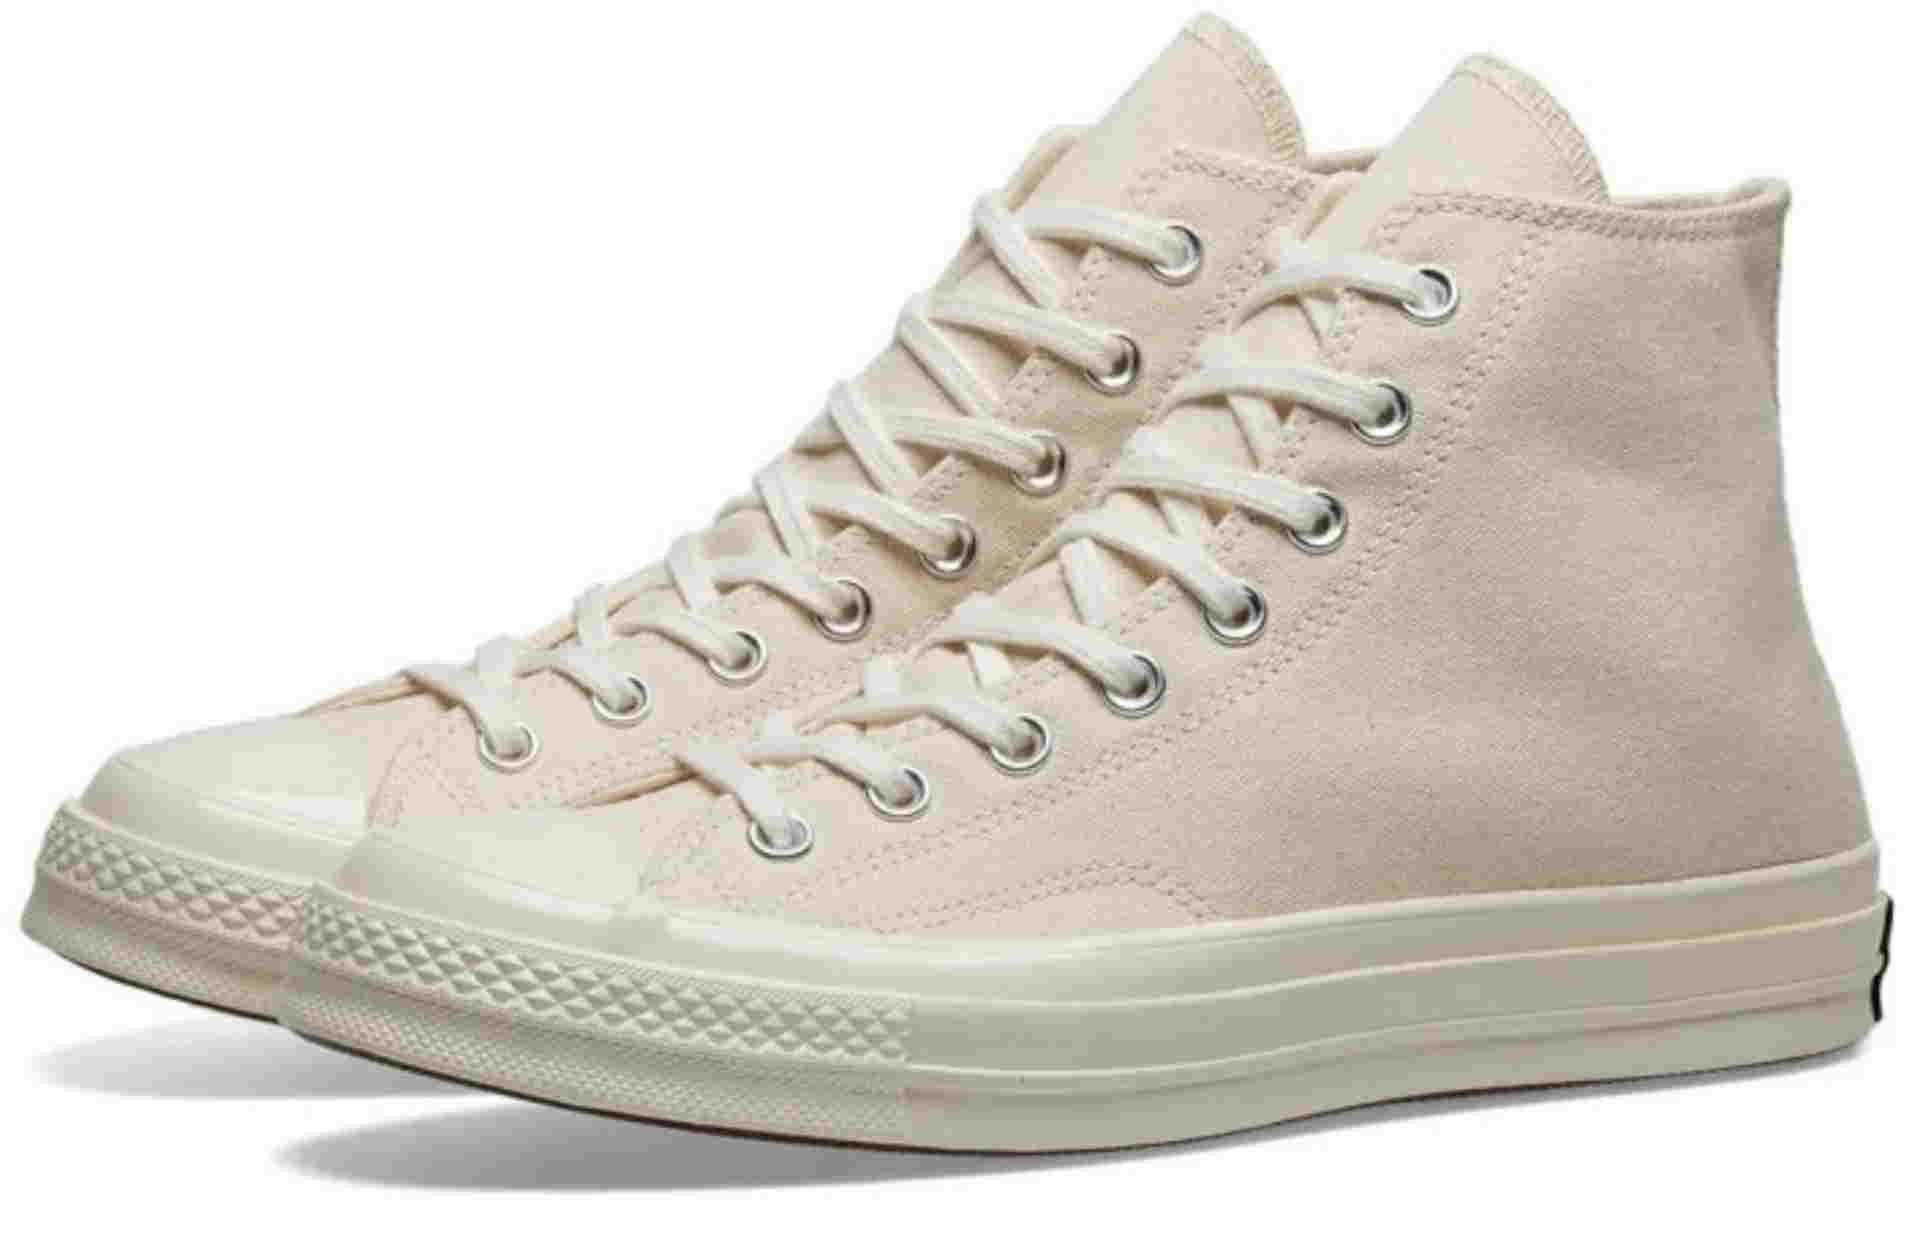 6 sneakers για όλες τις ηλικίες και όλα τα στυλ